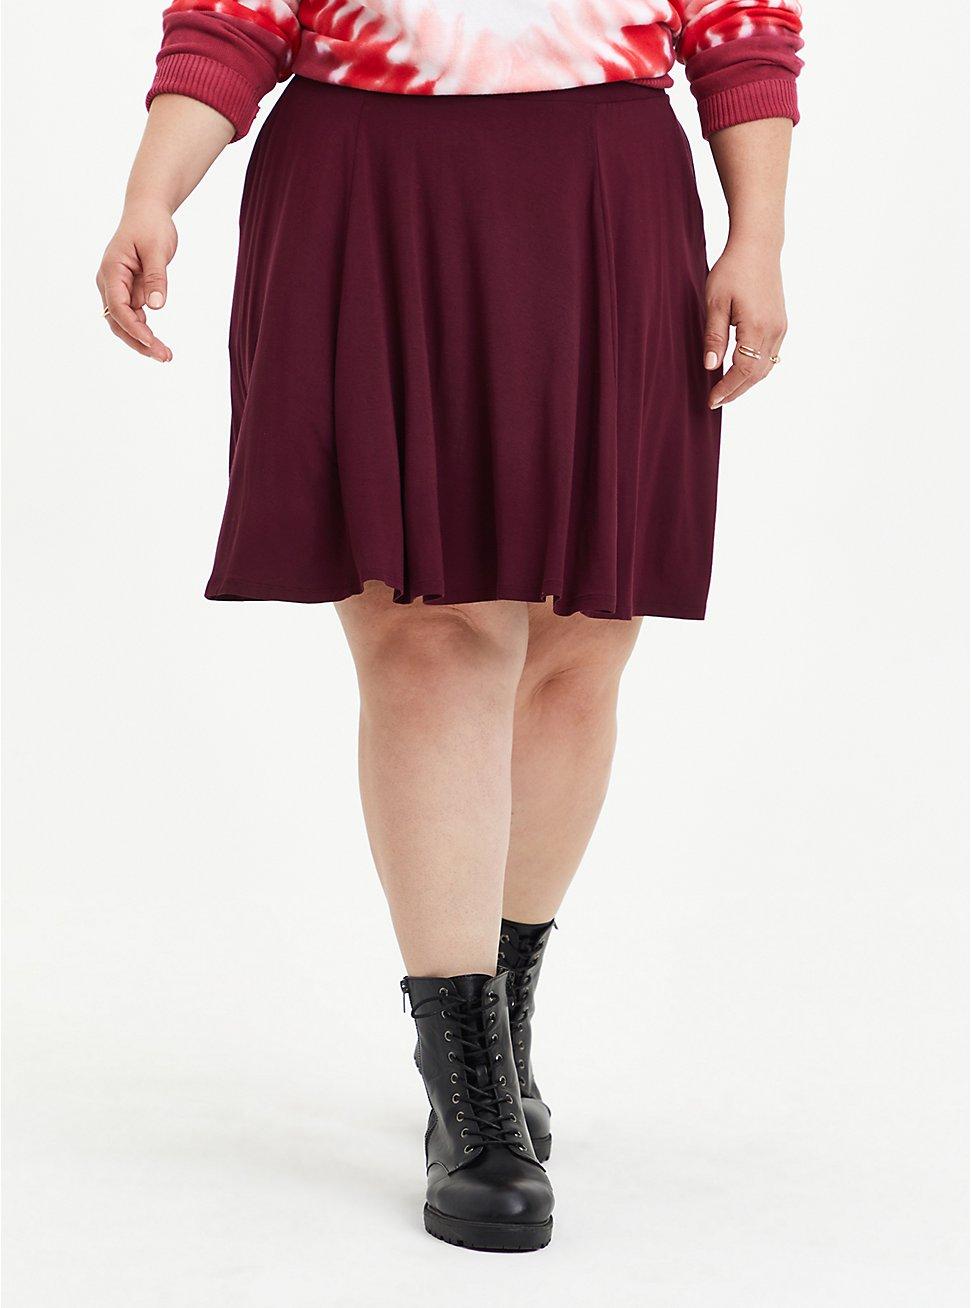 Circle Mini Skirt - Super Soft Burgundy, , hi-res